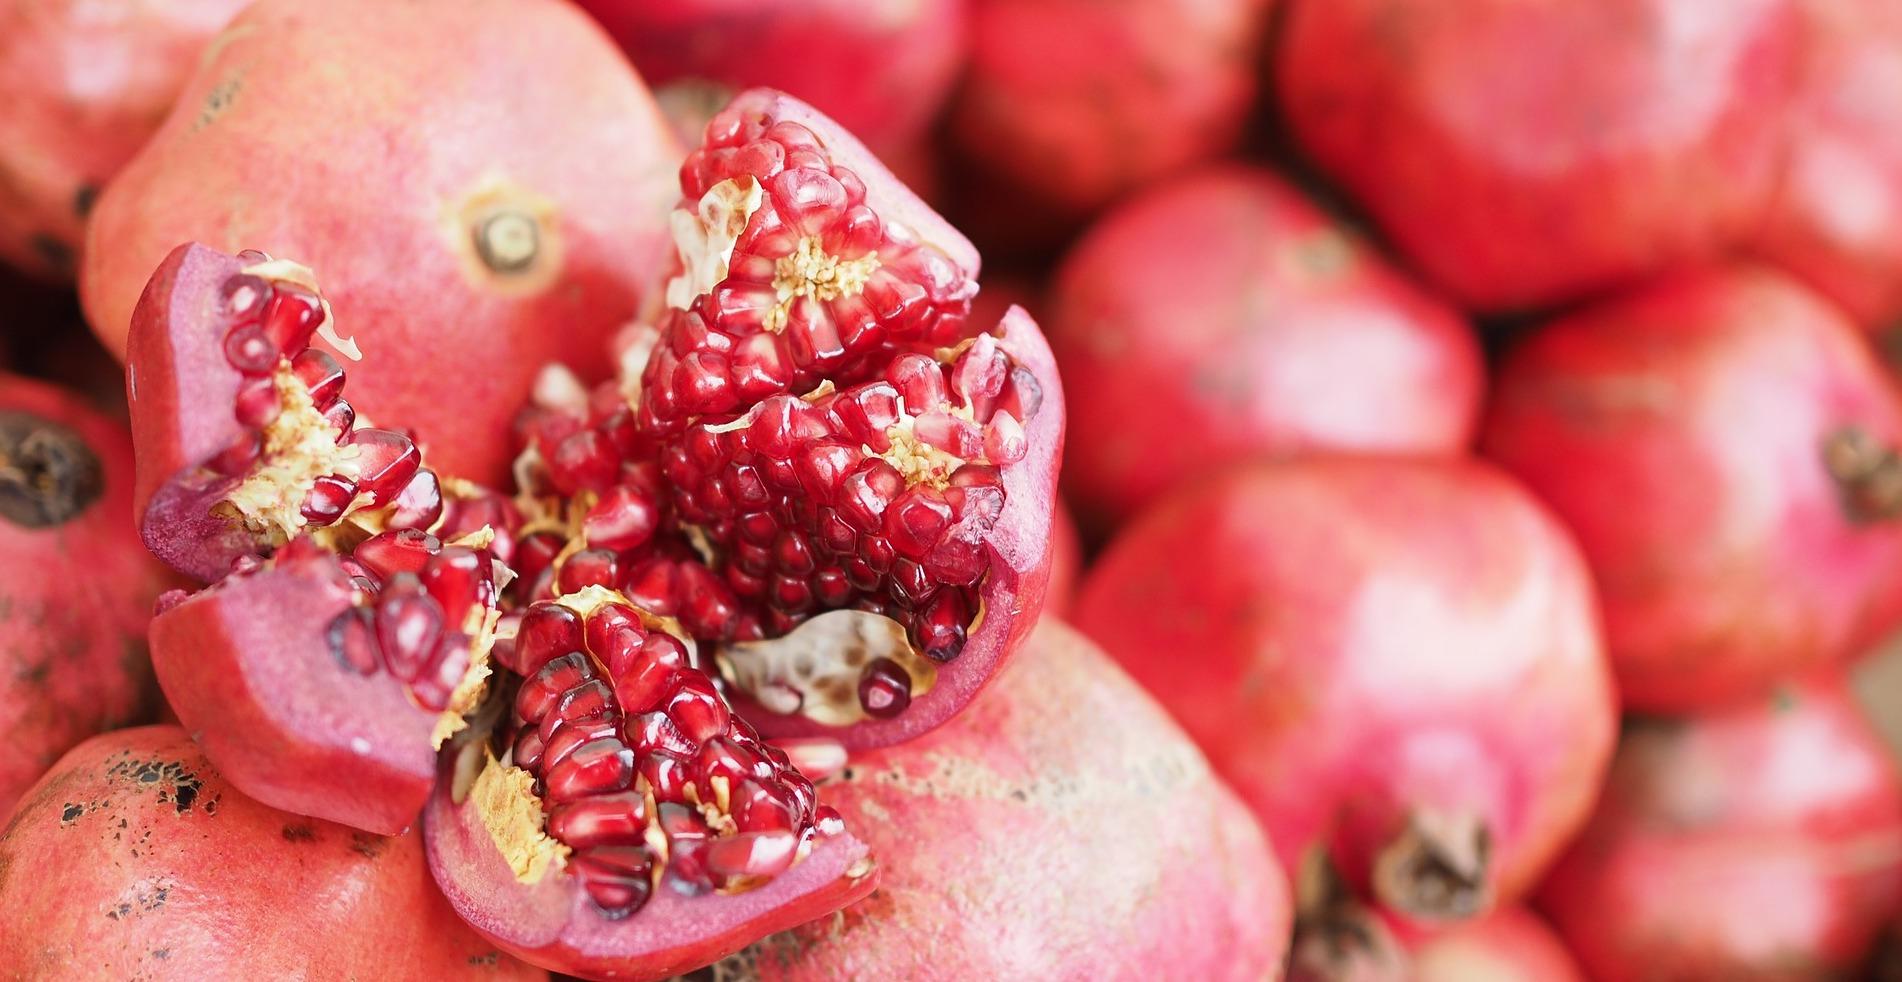 fruit-3200173_1920